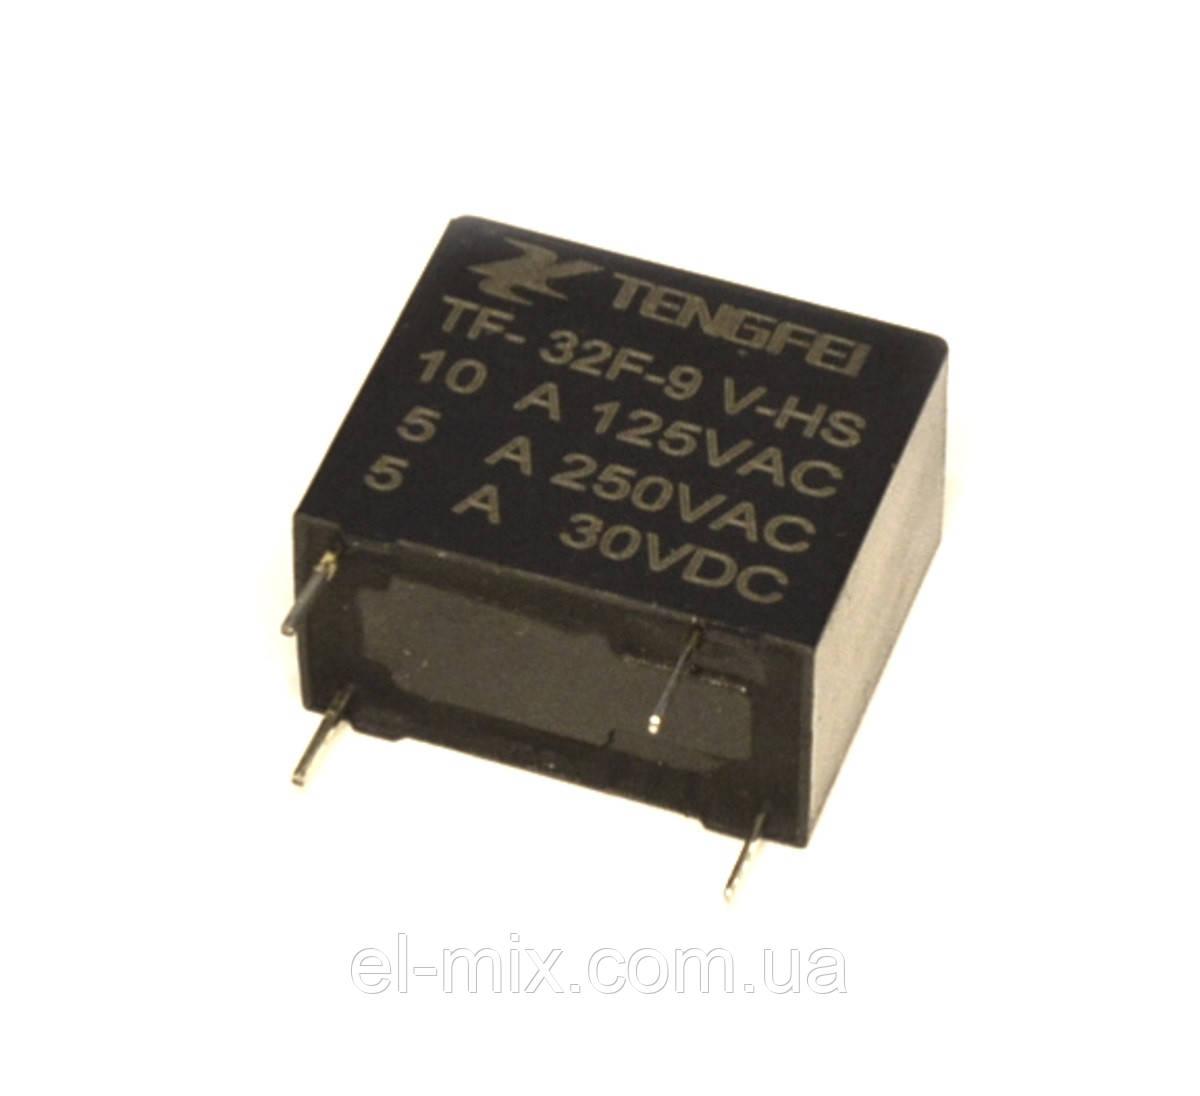 Реле   9V 1група  TF-32F-9V-HS-1A (JZC-32F) (5А 250V) 4pin off-on  Tengfei